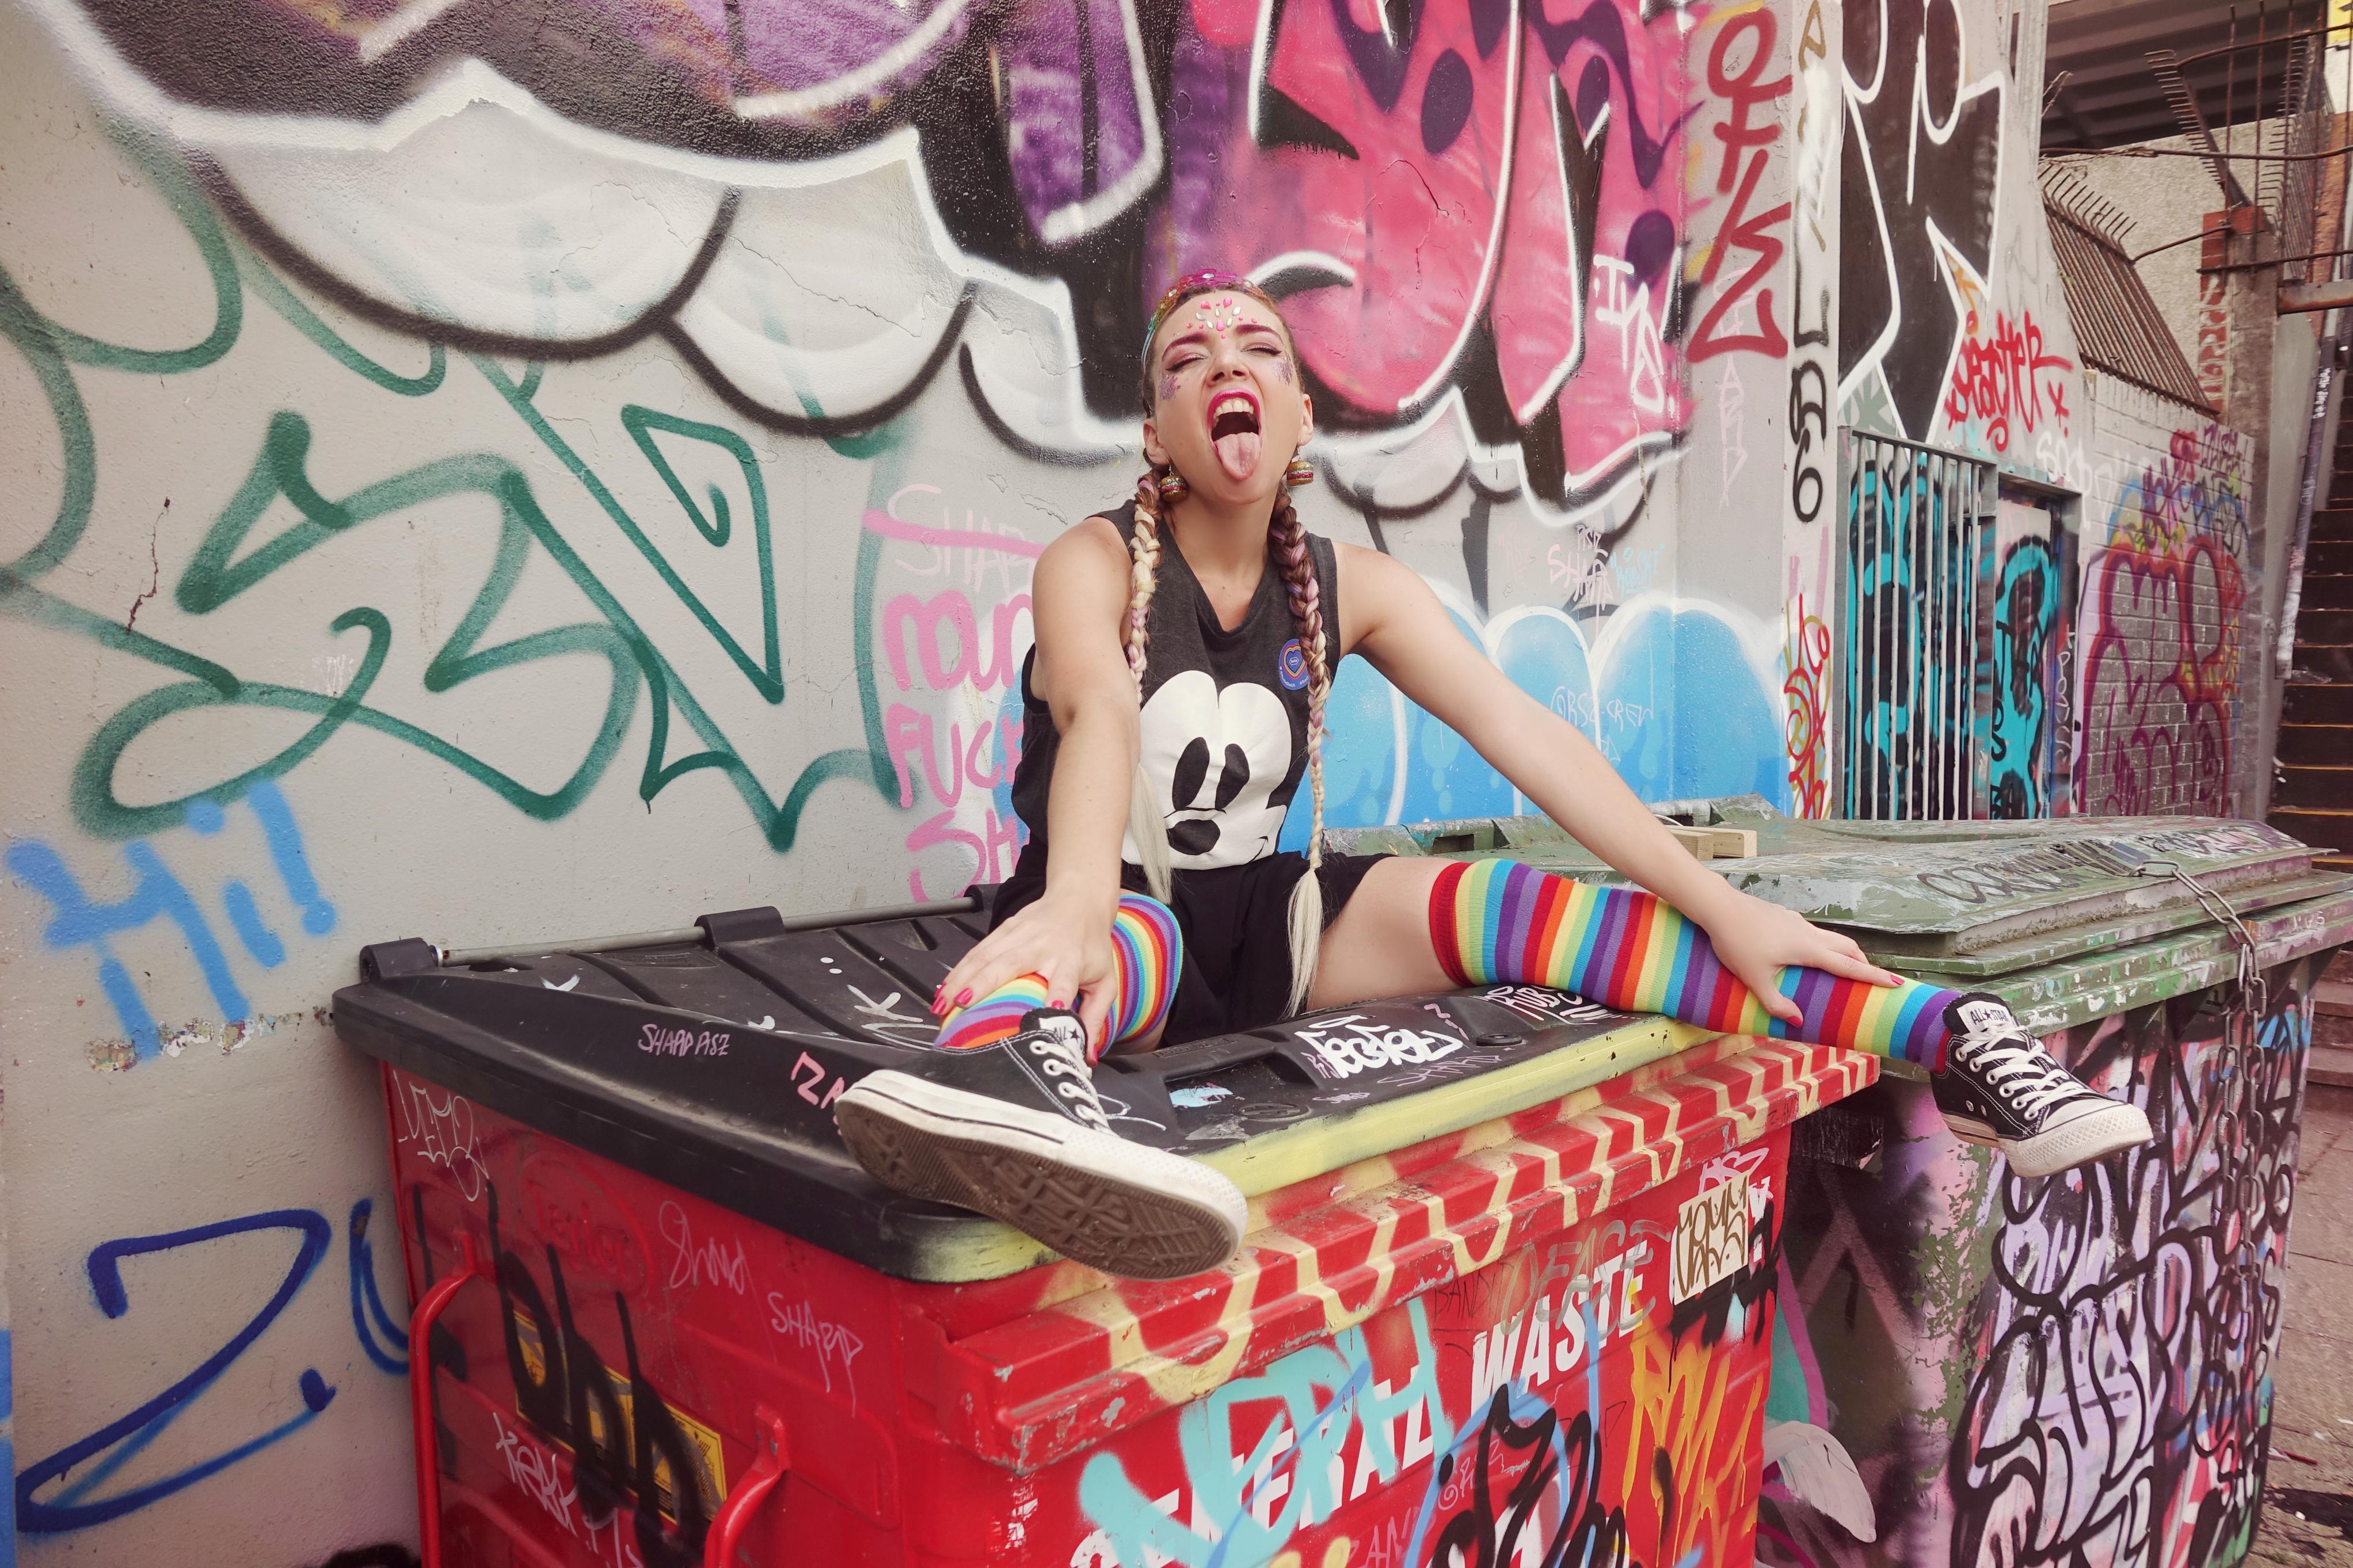 Look-festival-Chicadicta-fashionista-PiensaenChic-influencer-blog-de-moda-maquillaje-de-purpurina-rainbow-outfit-Chic-adicta-Piensa-en-Chic